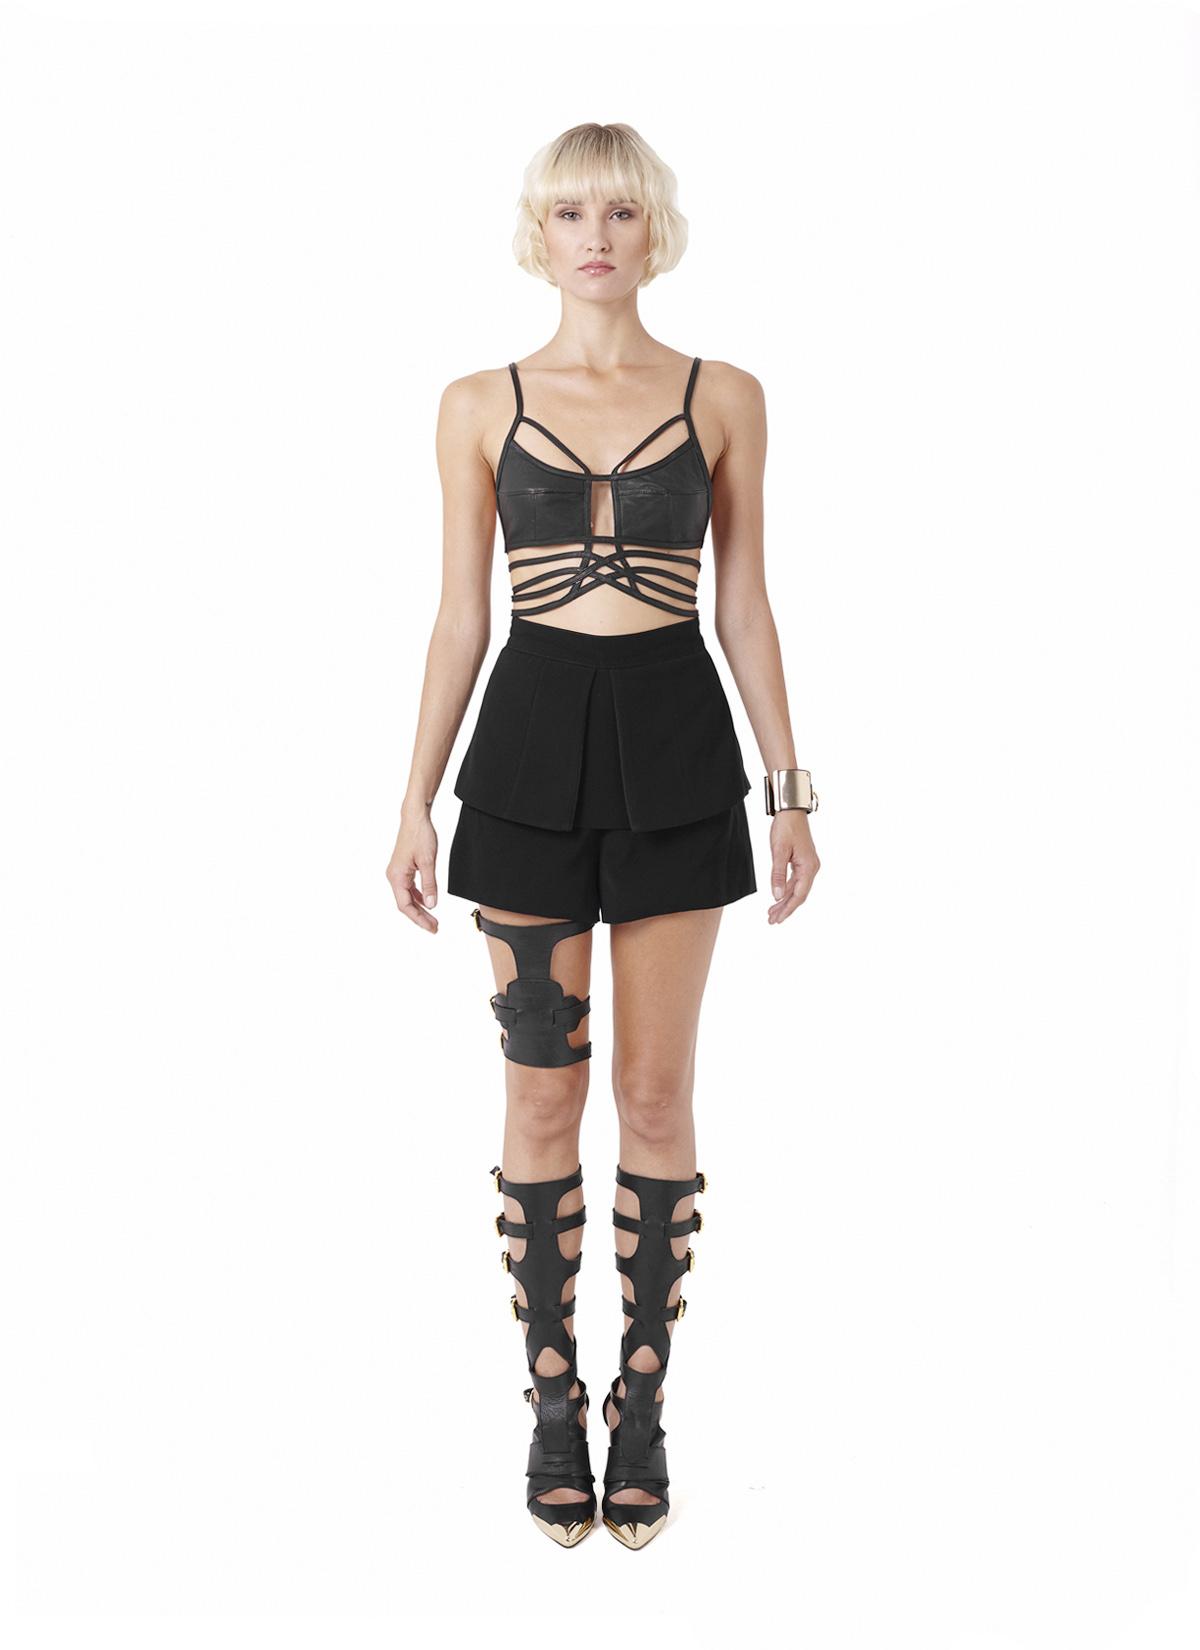 Dyshic top, Syenne shorts & Spar Leg piece